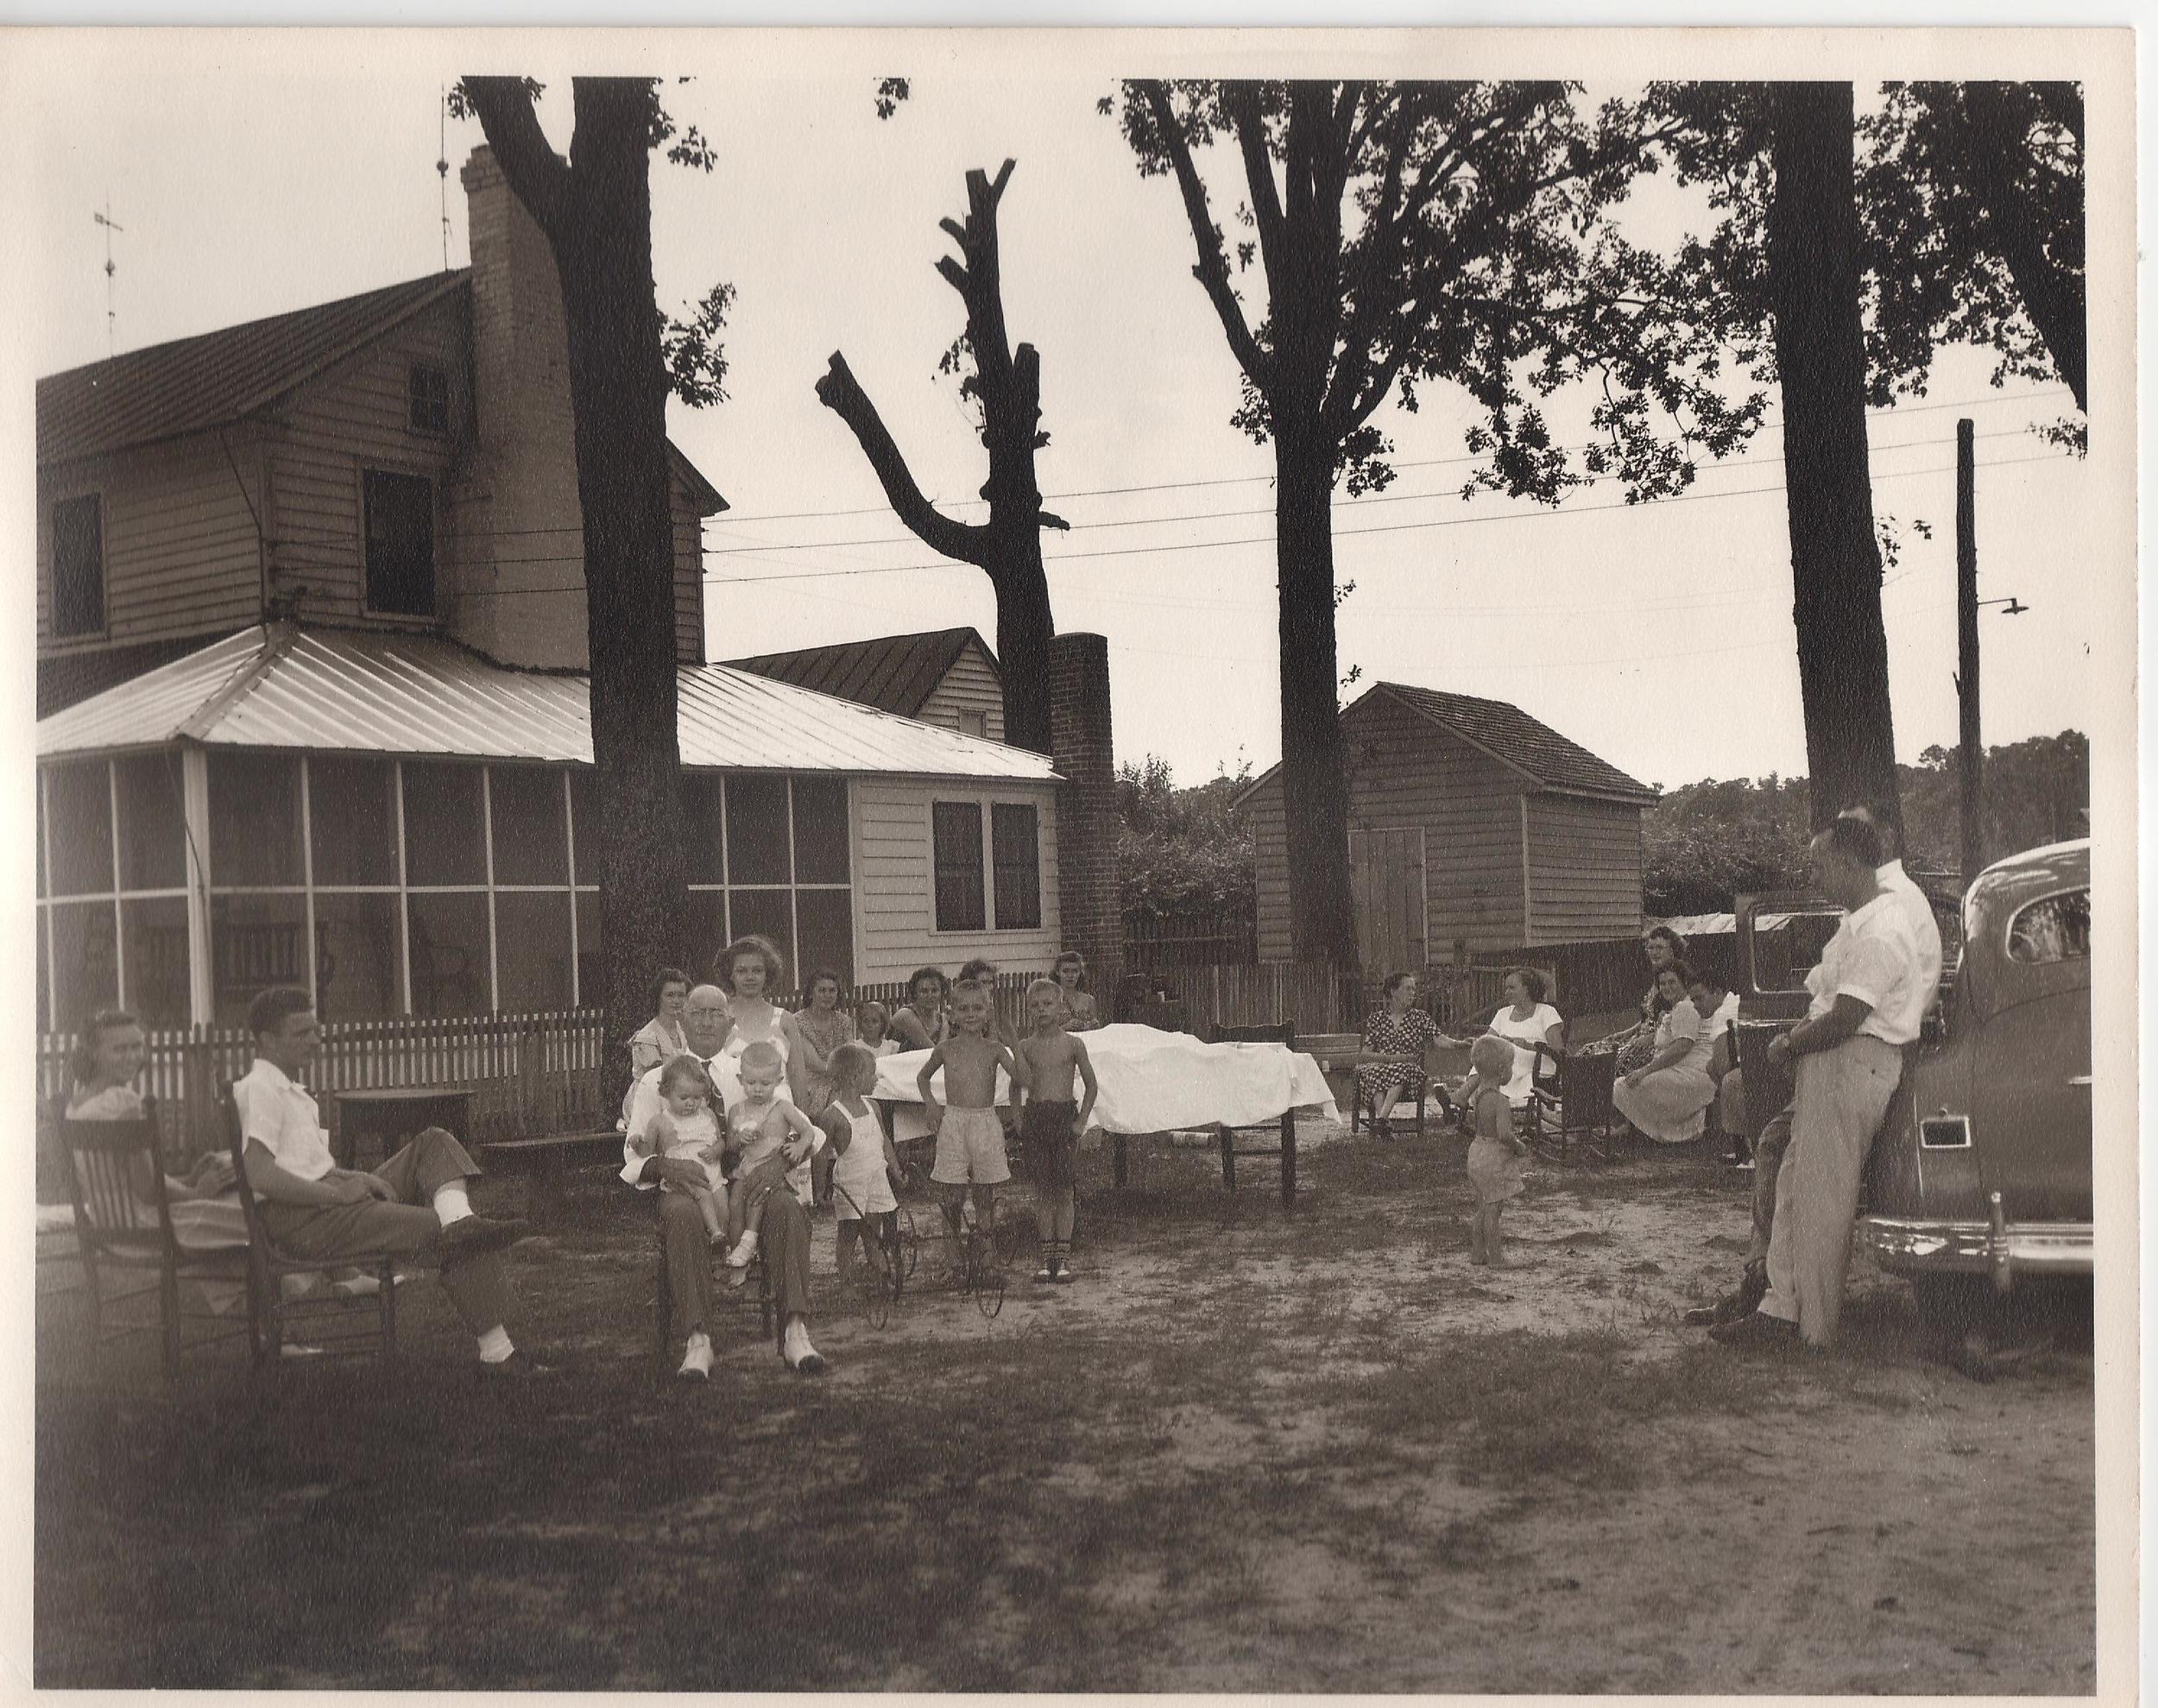 Everett Family Picnic on the farm